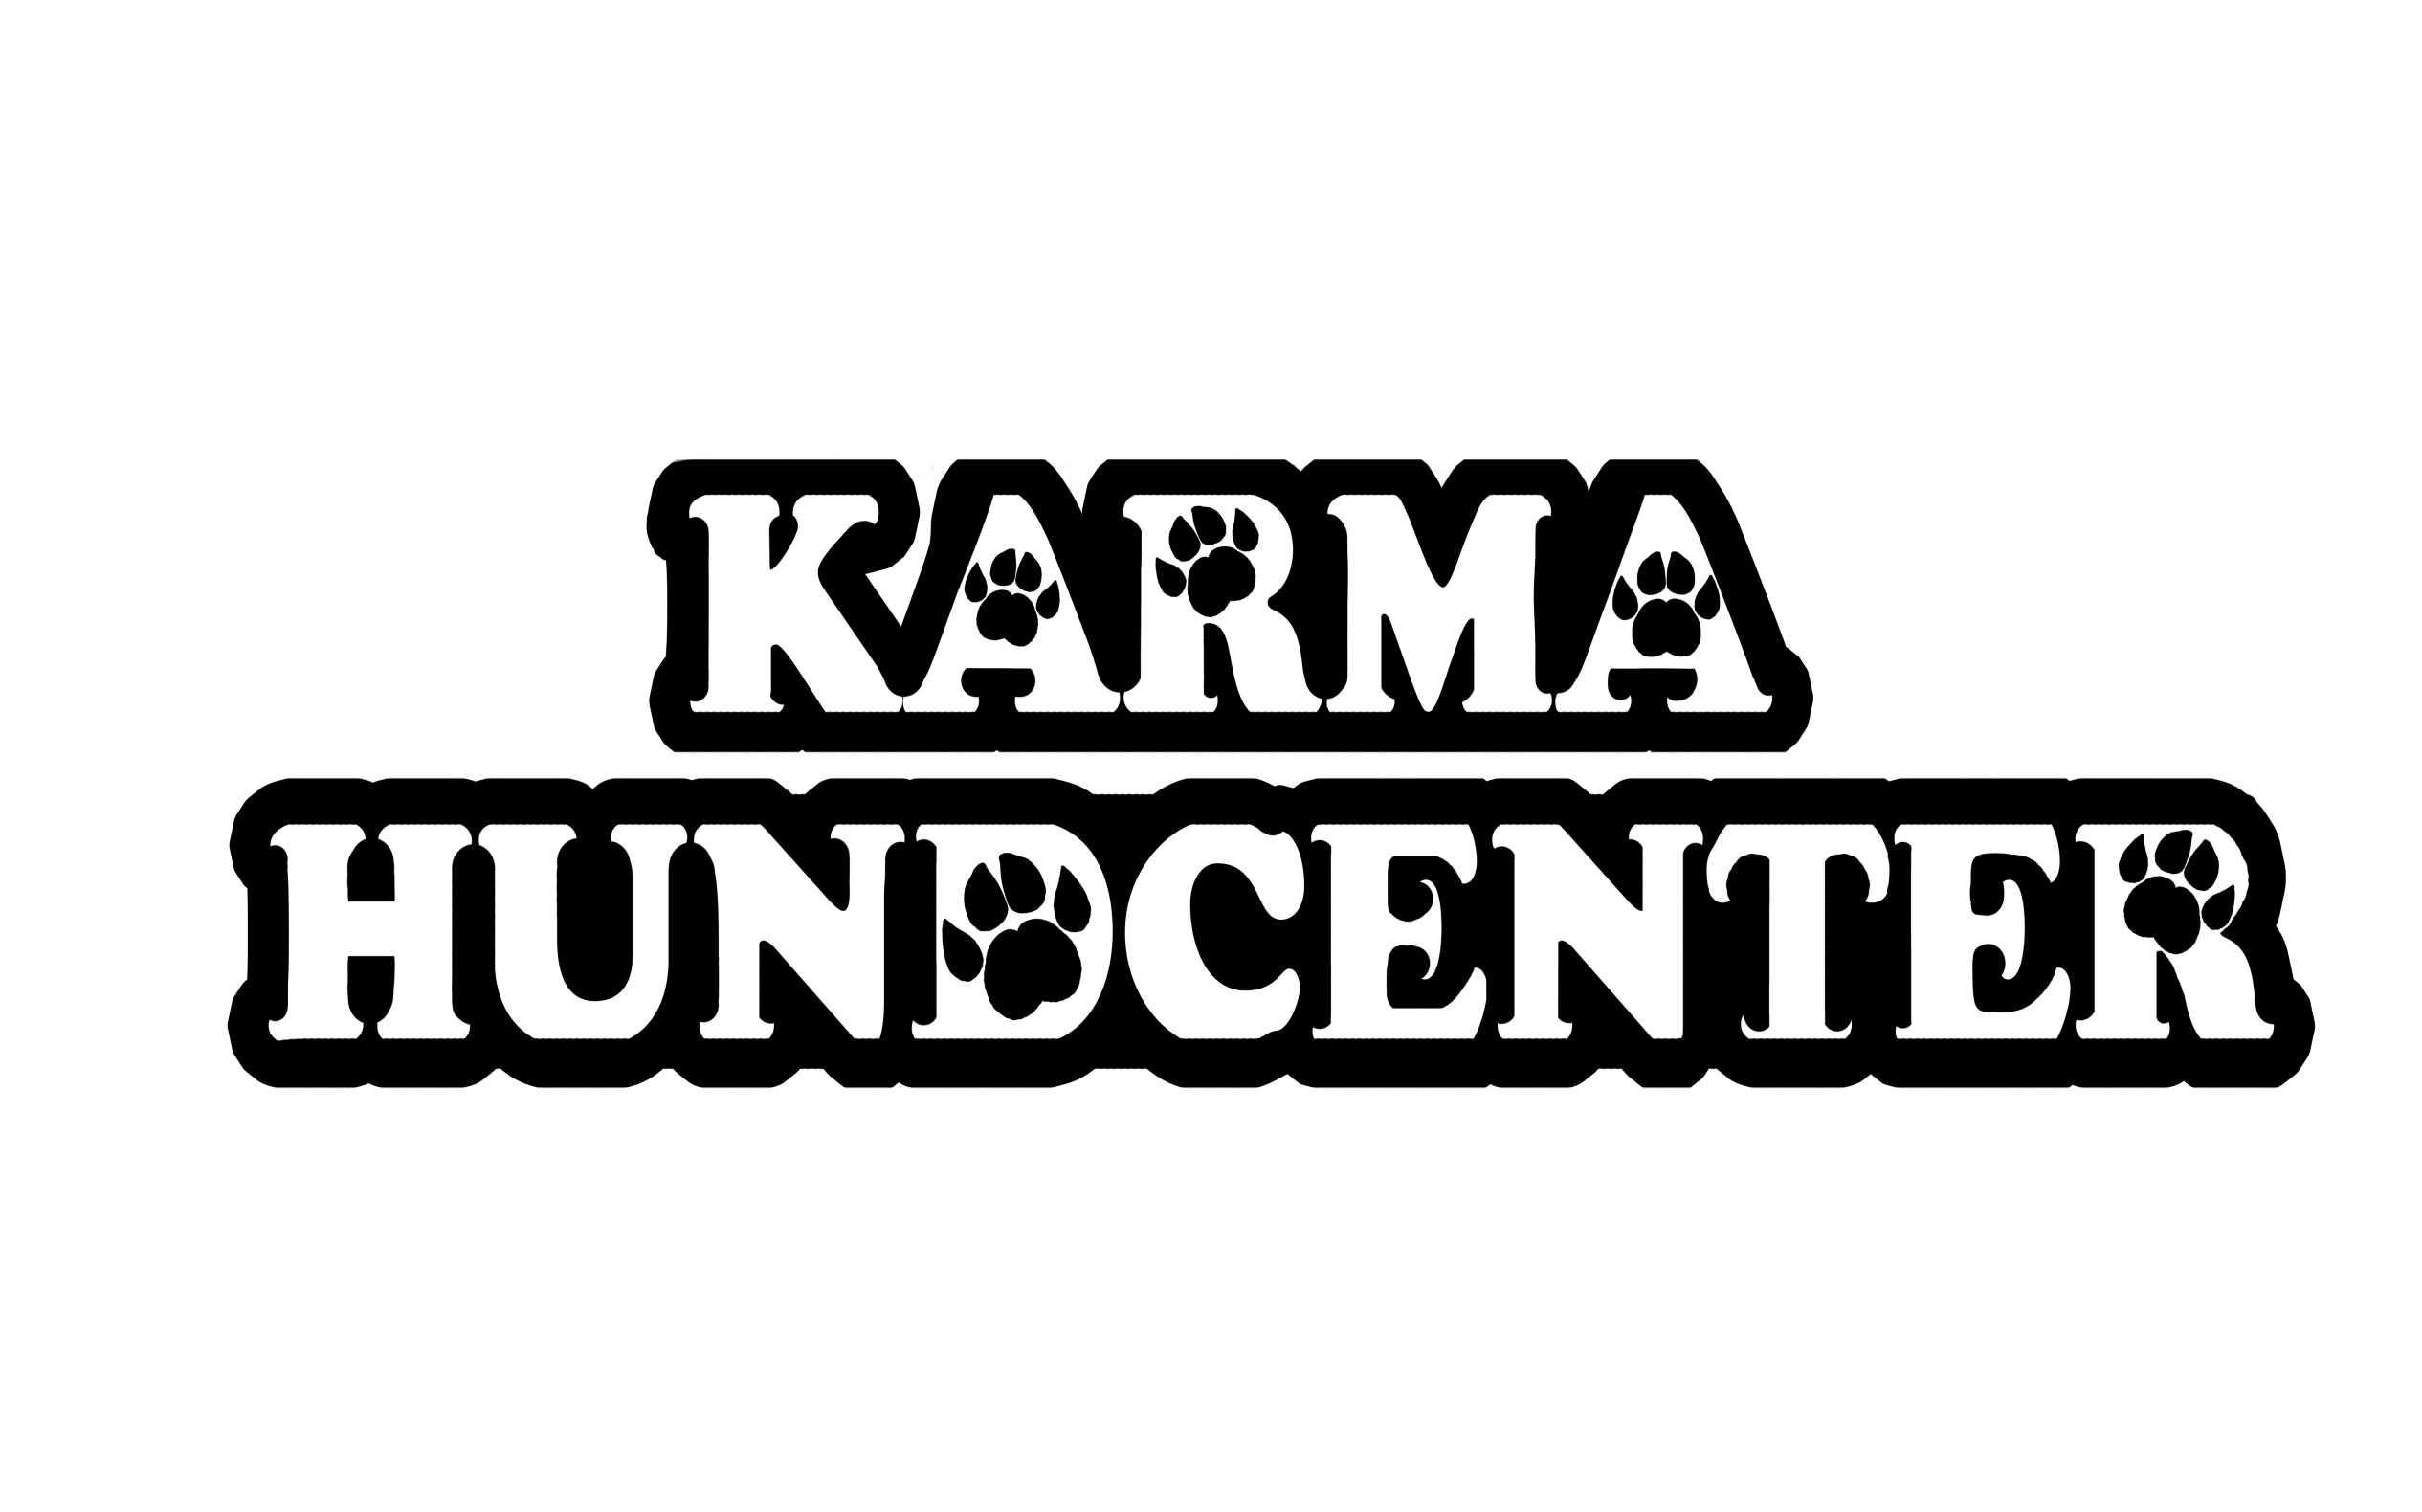 Karma Hundcenter